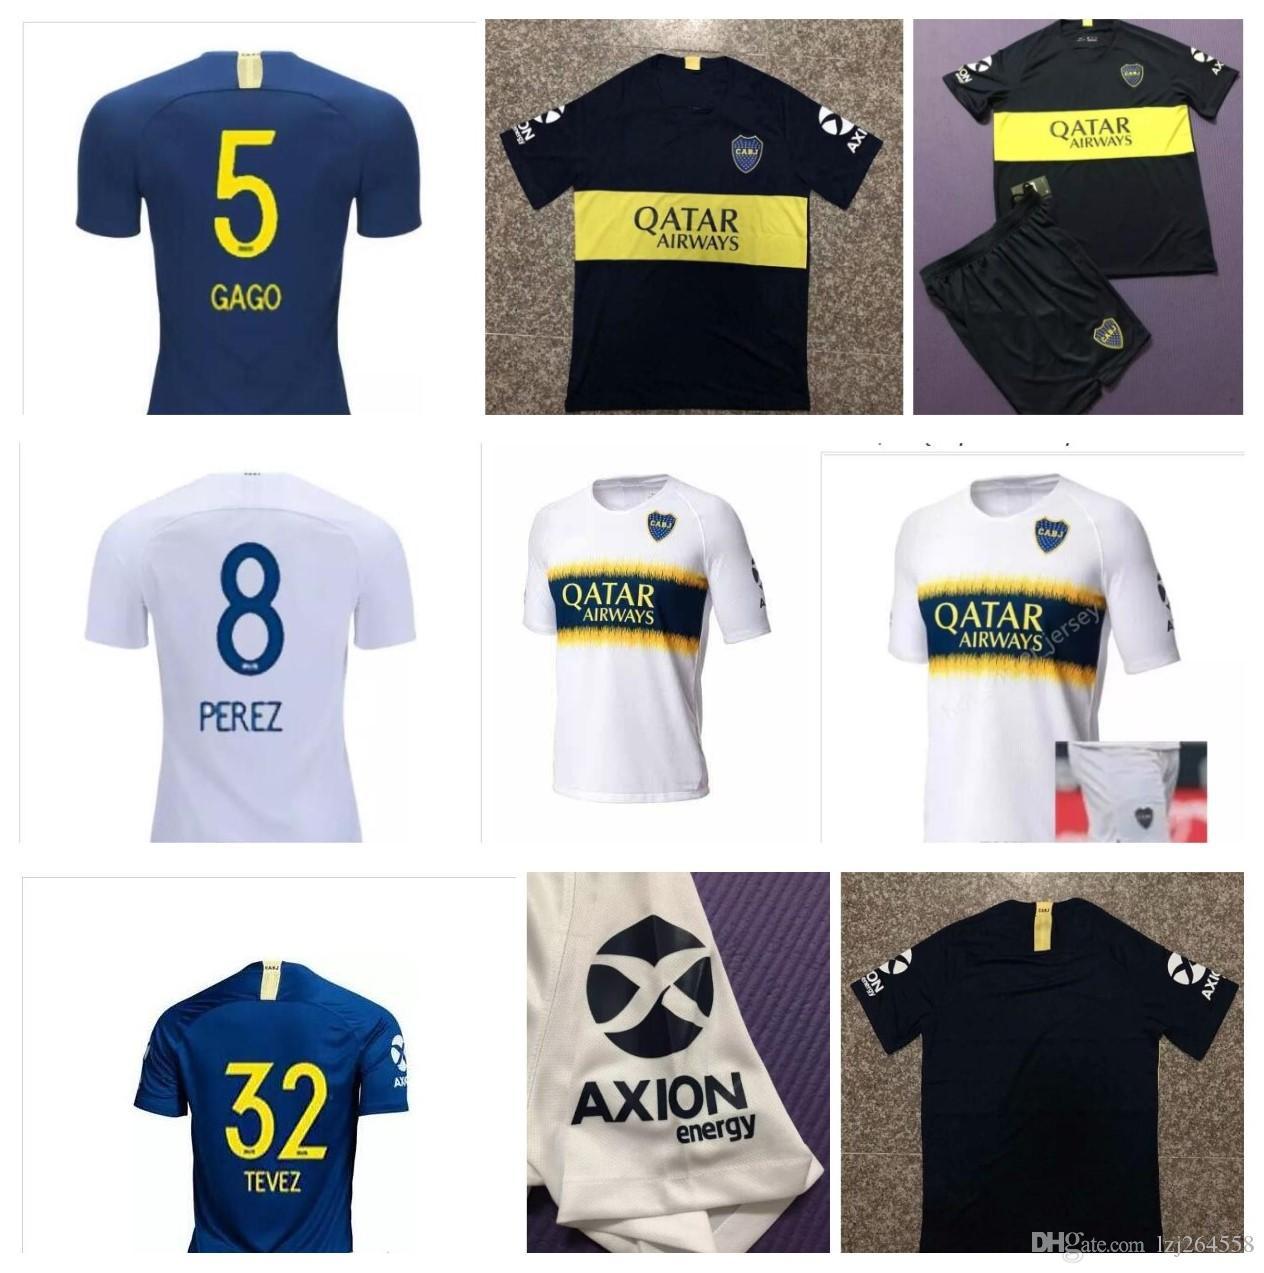 Nuevo 2018 Camisa Boca Juniors Jersey 2019 Camisetas De Fútbol Camiseta De  Fútbol Chandal GAGO OSVALDO Uniformes Camisetas De Futebol TOP TEVEZ ... ba1f71f0765b3